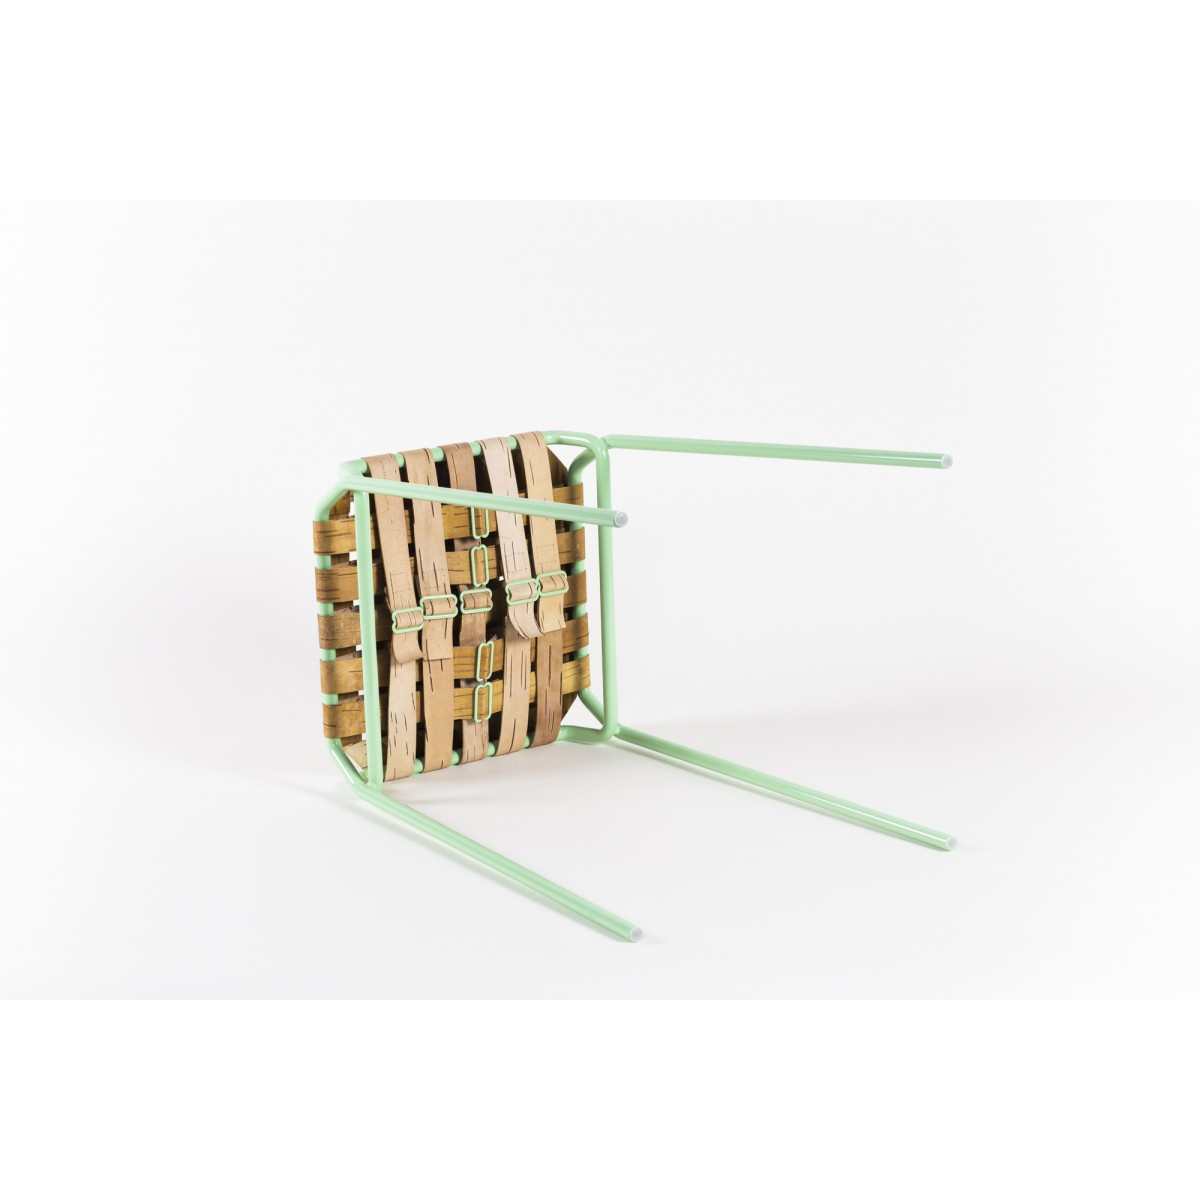 MOYA Hocker aus Birkenrinde Taburet | Stool